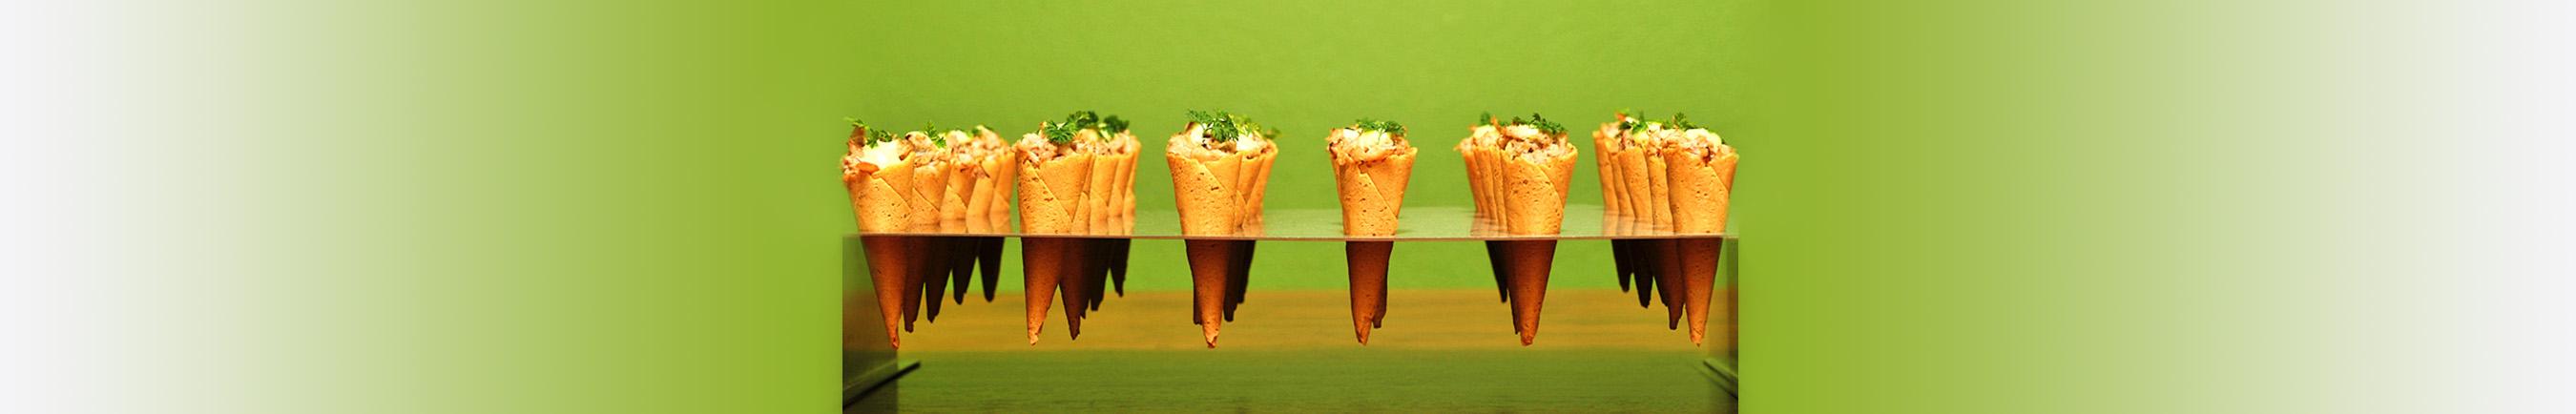 slideshow-cones